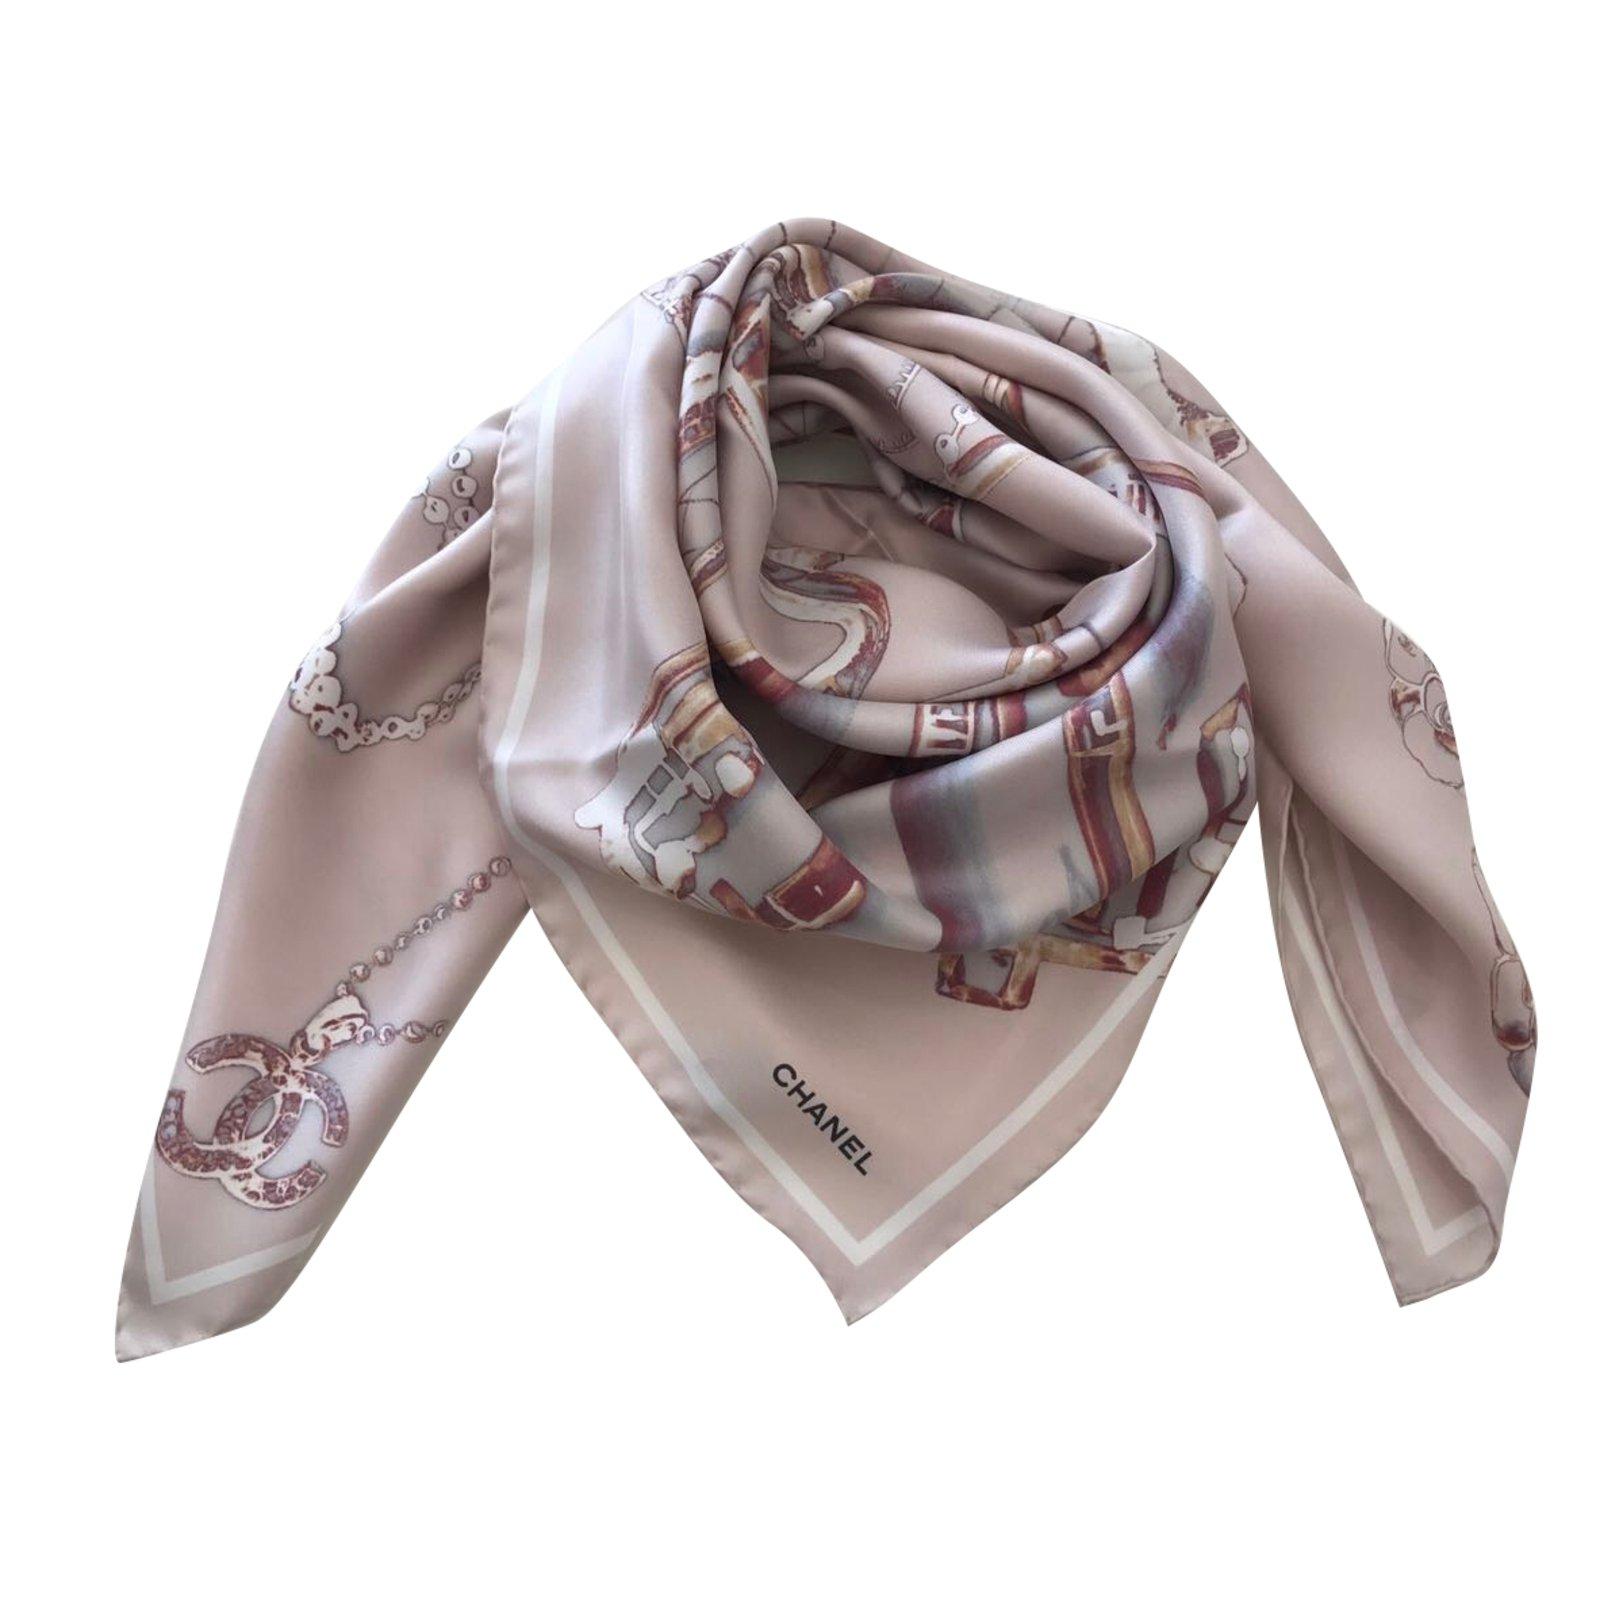 66cbb0cfaf8 Foulards Chanel FOULARD CHANEL SOIE Soie Rose ref.45946 - Joli Closet